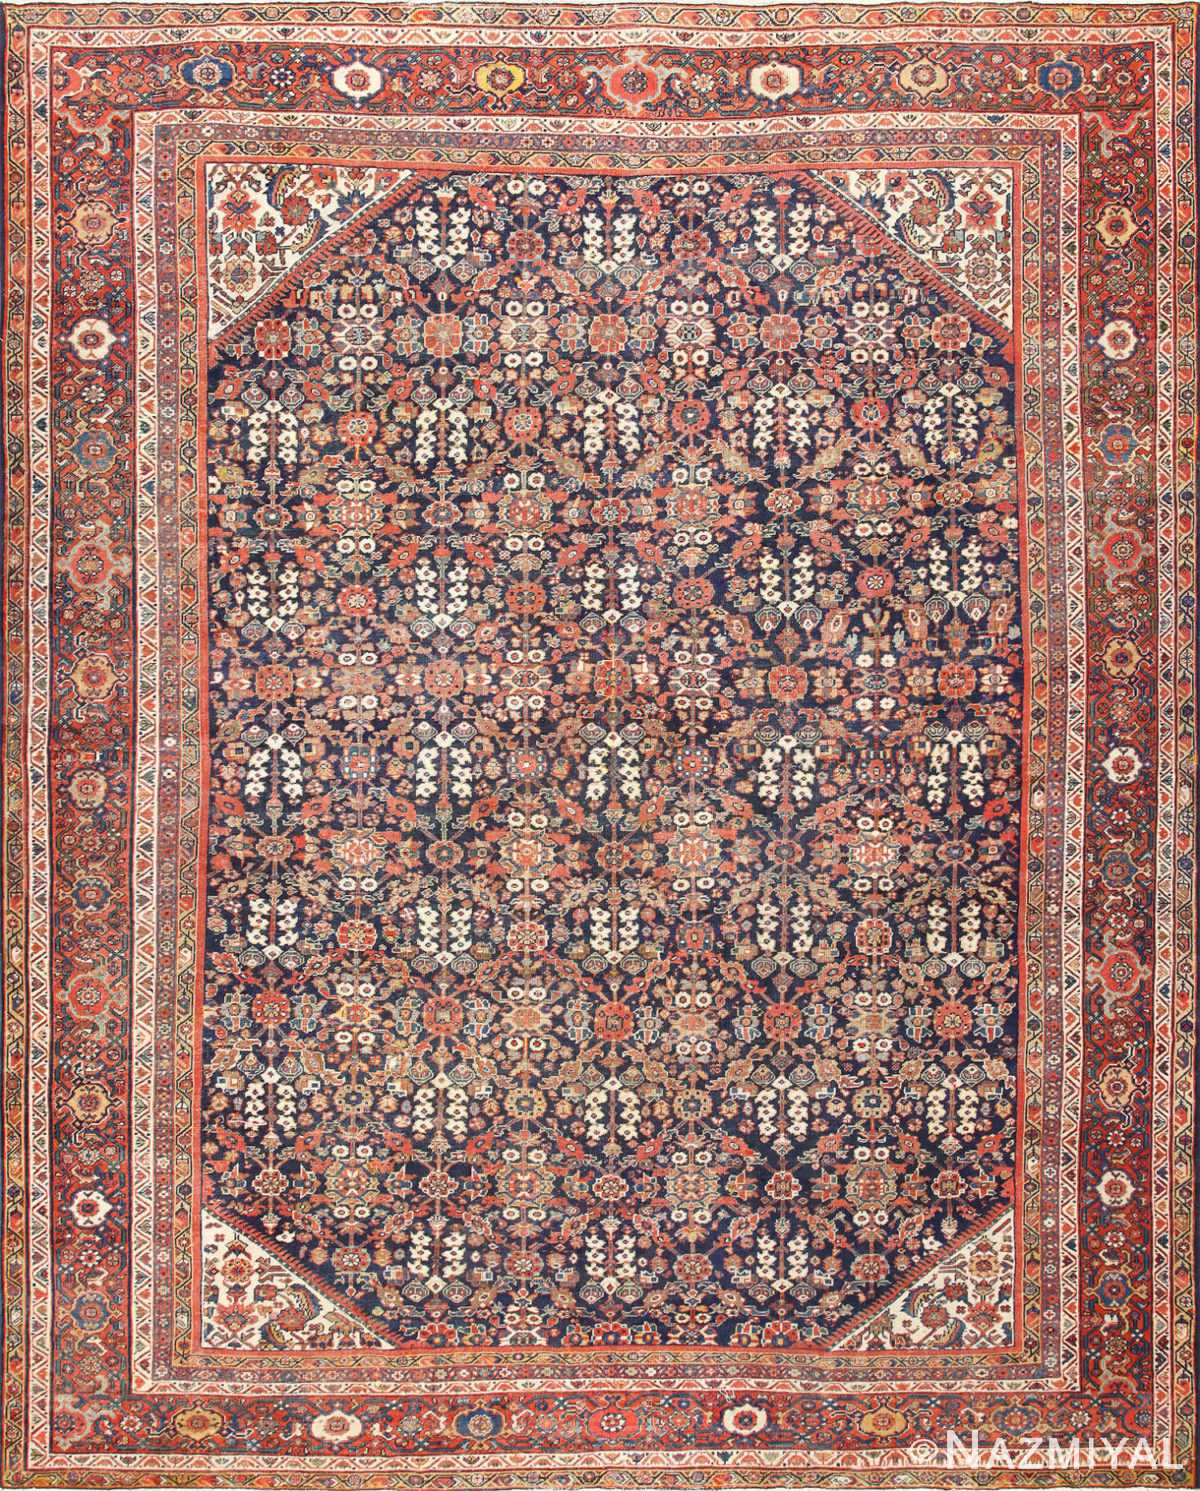 Blue Background Persian Antique Sultanabad Rug 50684 Nazmiyal